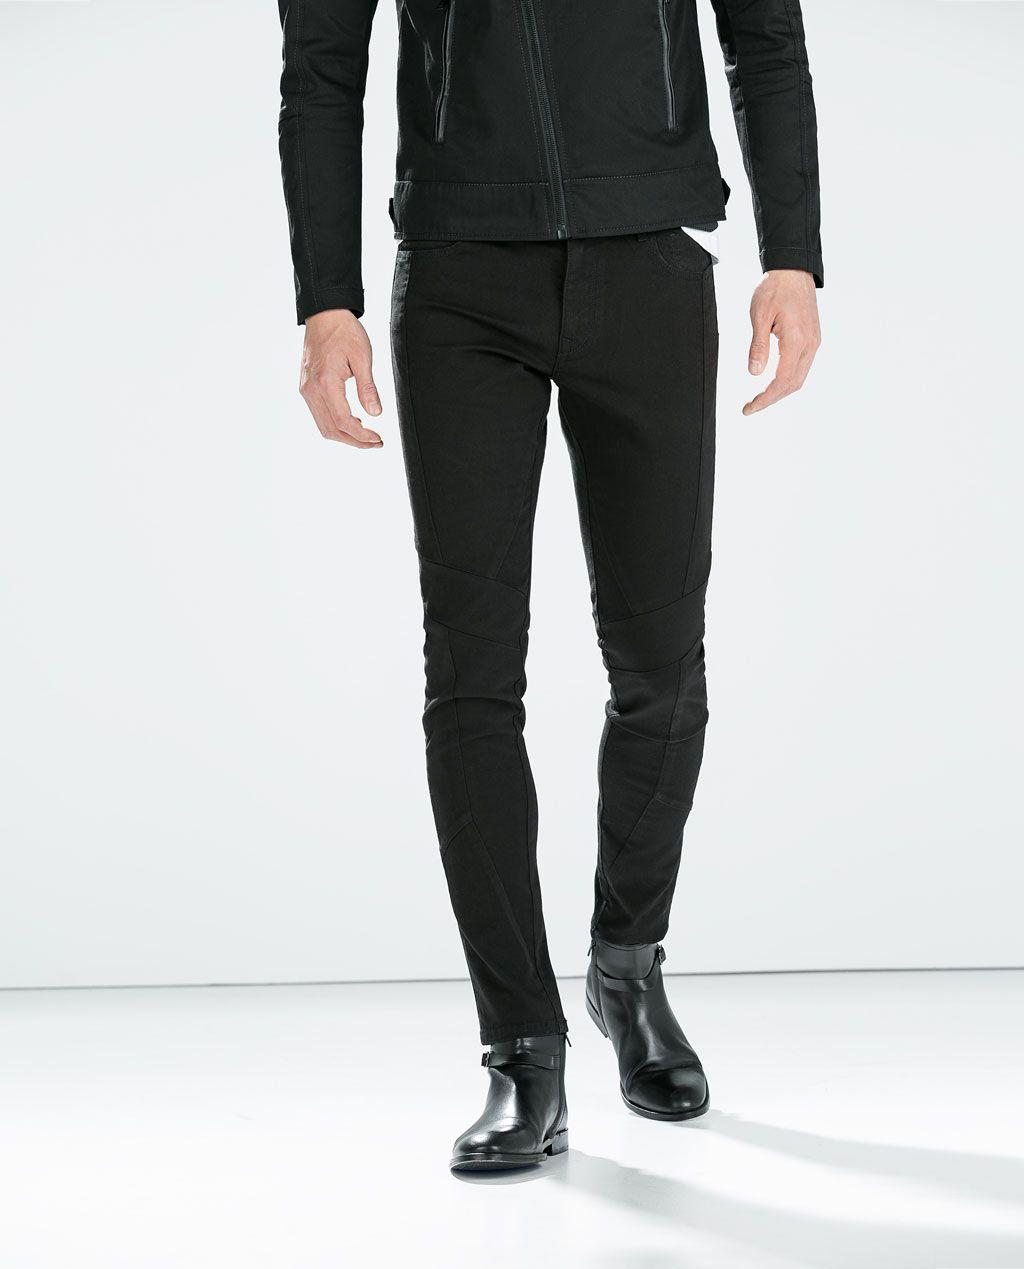 86536ec0f5 SEAMED SKINNY TROUSERS-Trousers-MAN-SALE AW.14 | ZARA United States ...